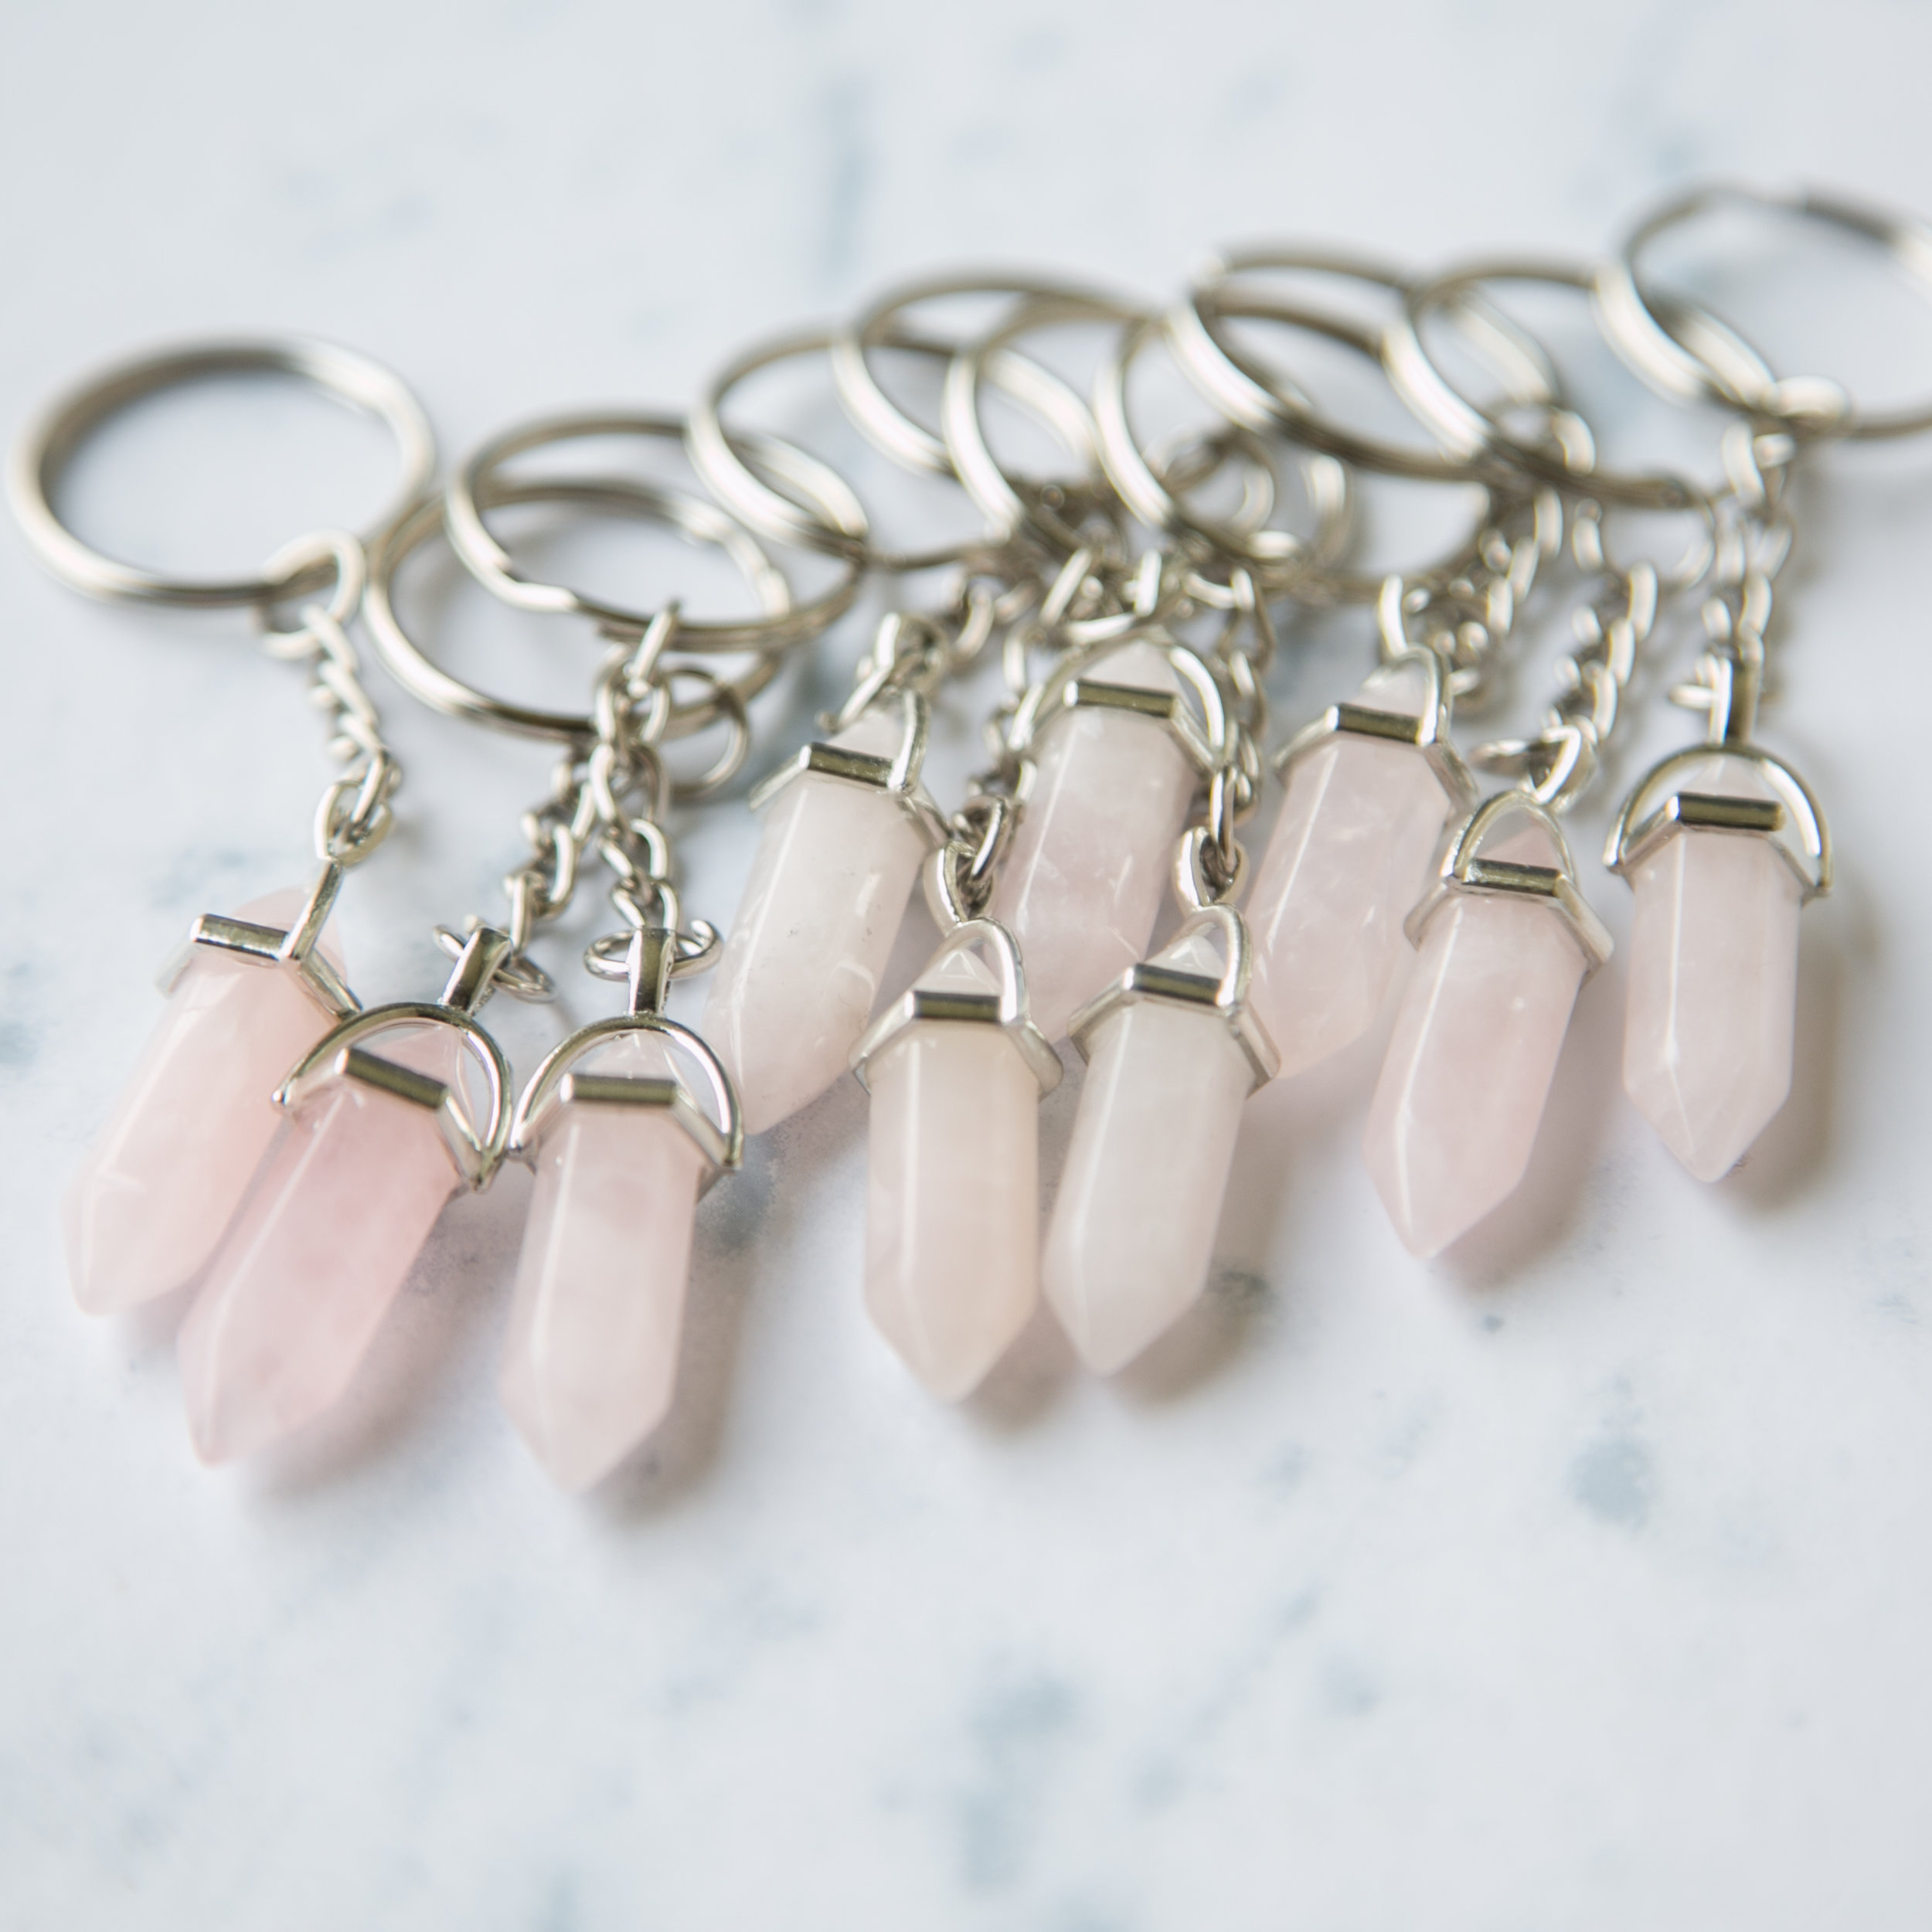 Quartz Crystal Key Chain